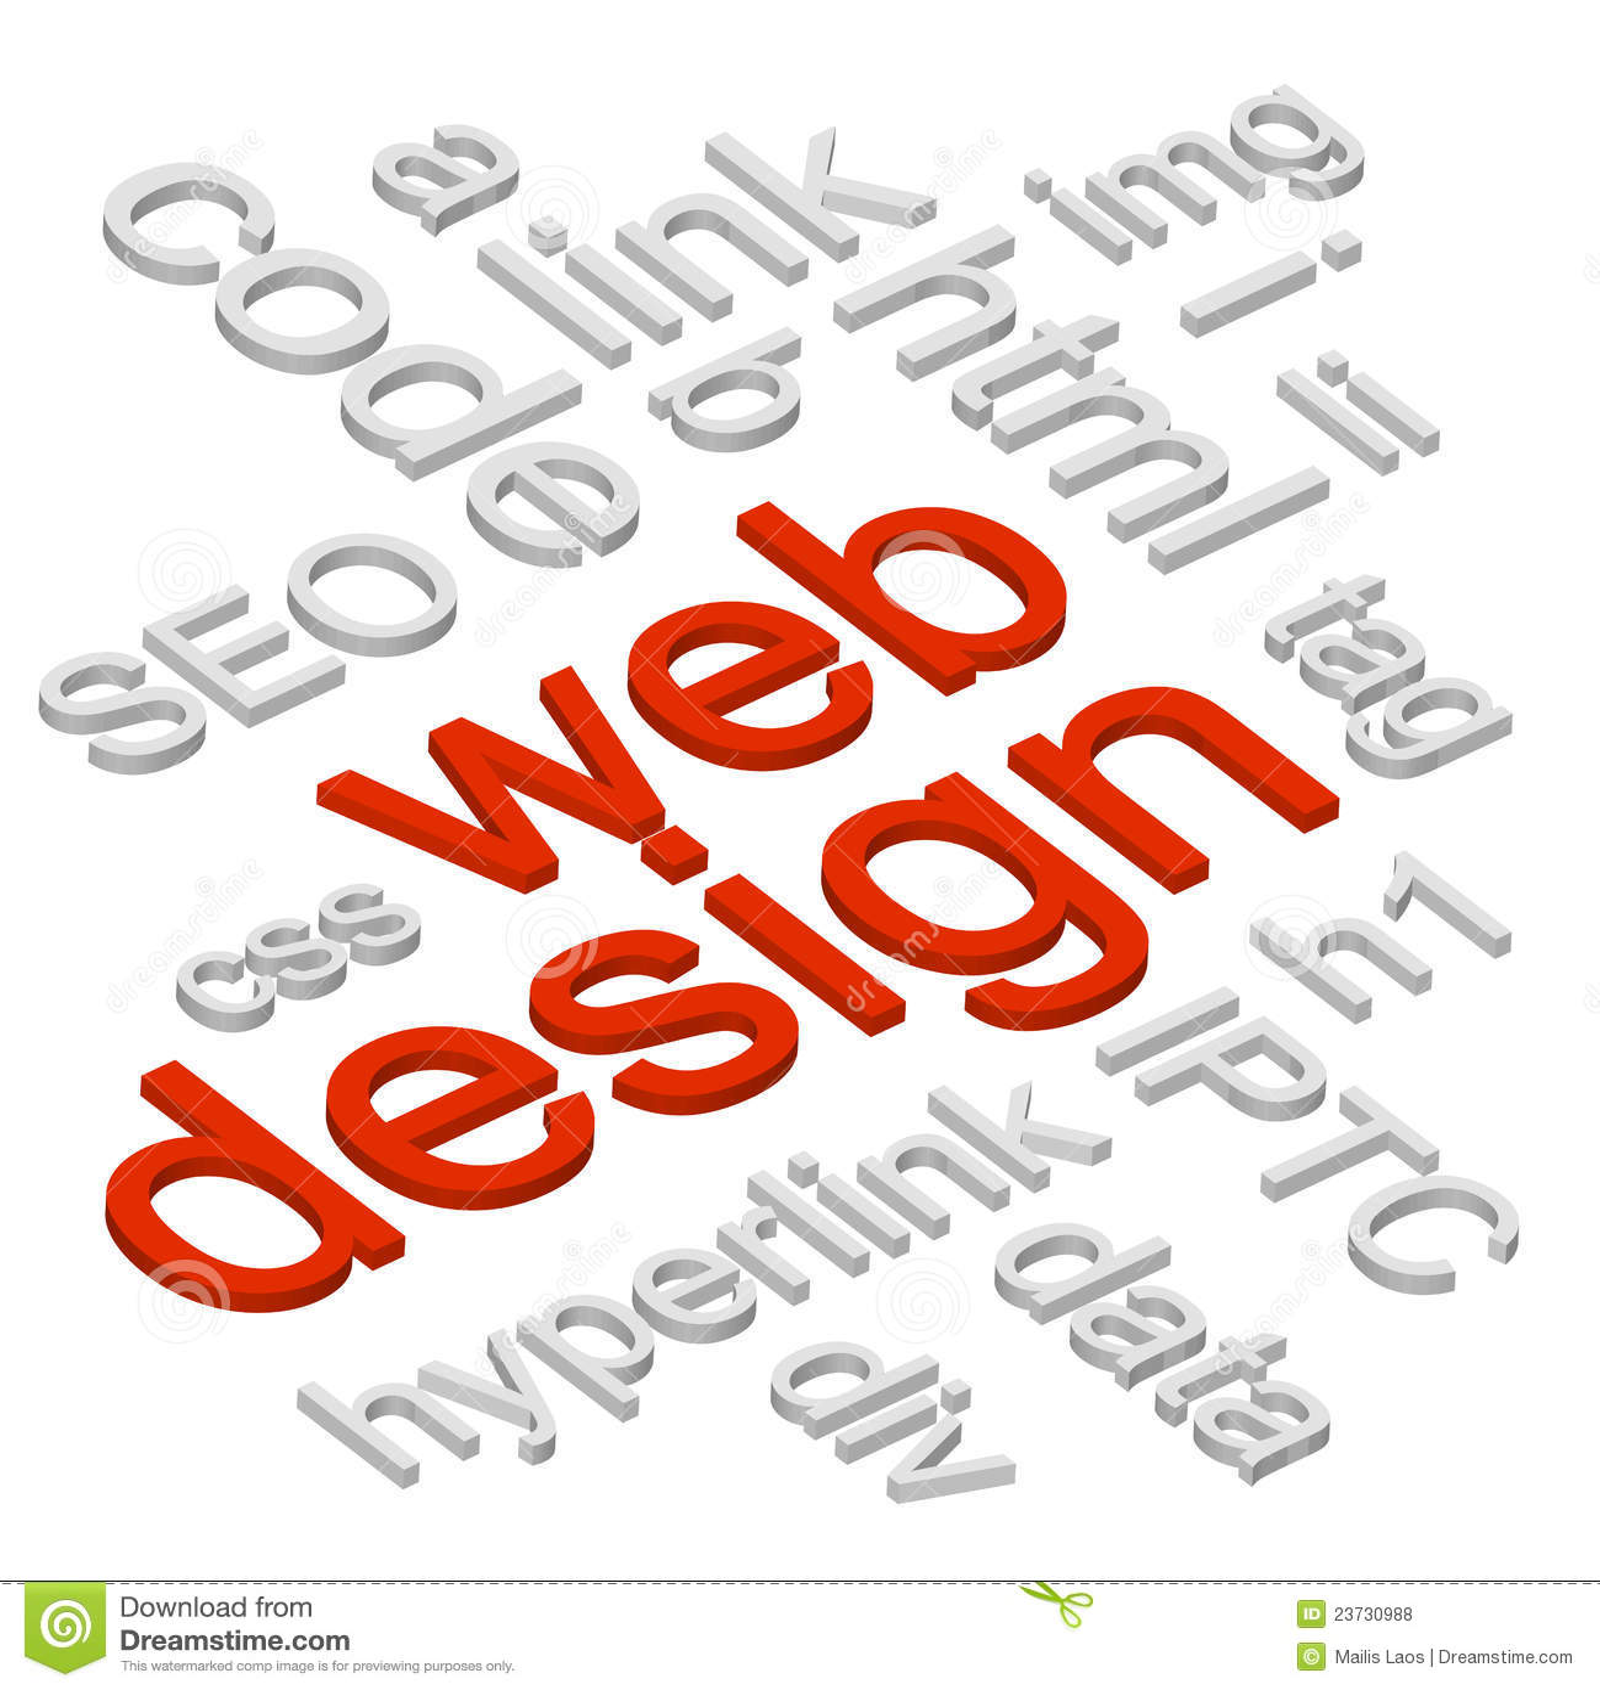 The Word Websites: Web Design 3D Words Background Stock Vector